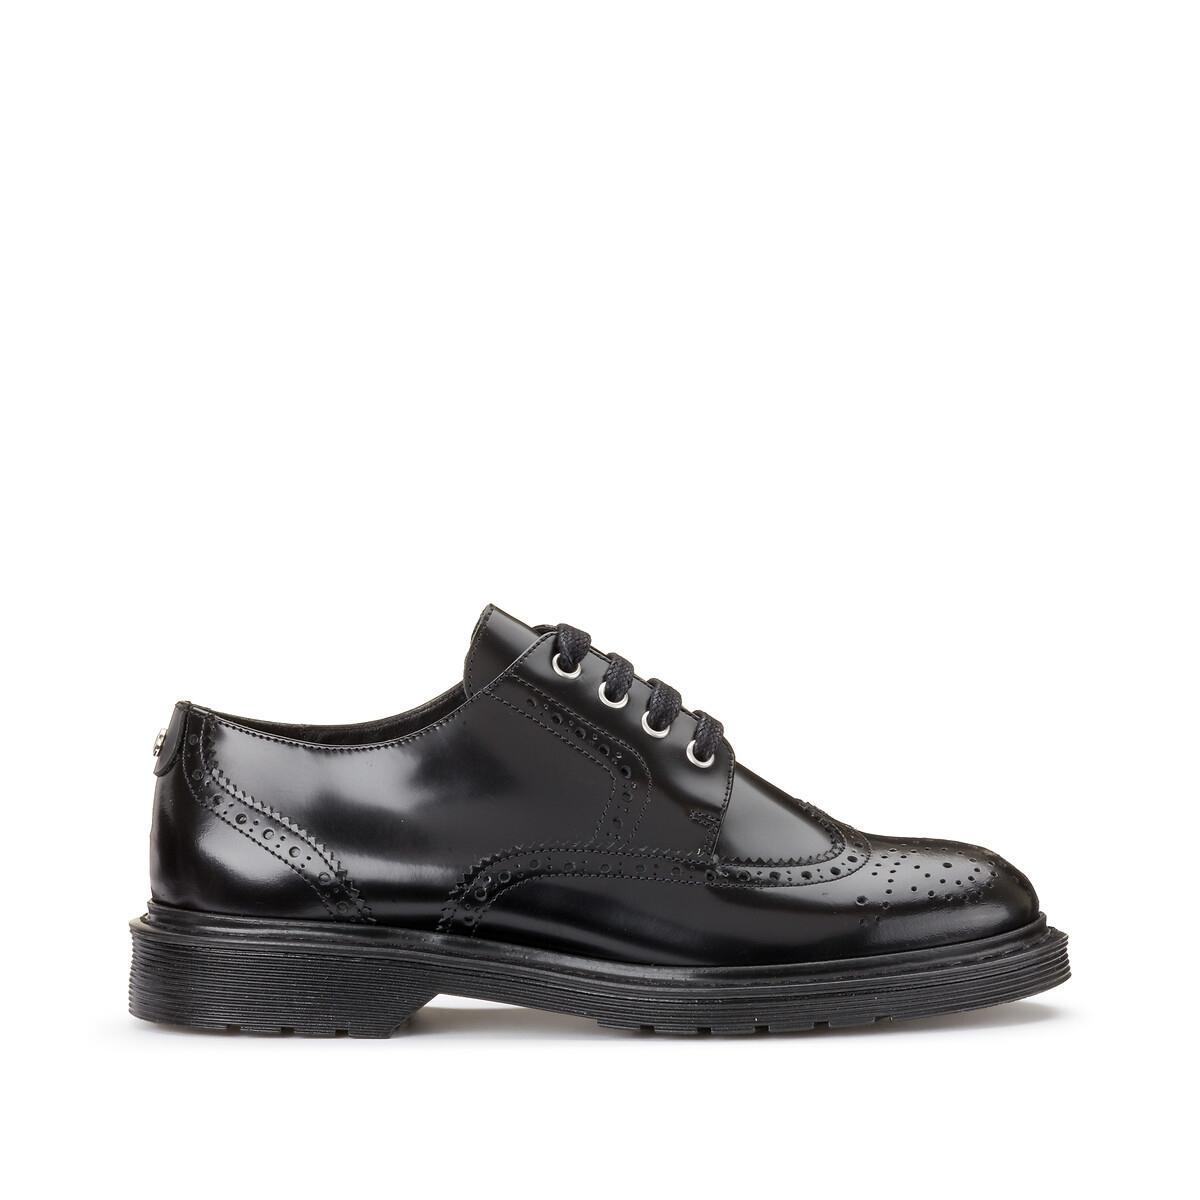 Ботинки-дерби LaRedoute Из кожи Vocilia 38 черный ботинки дерби из кожи teadale maira